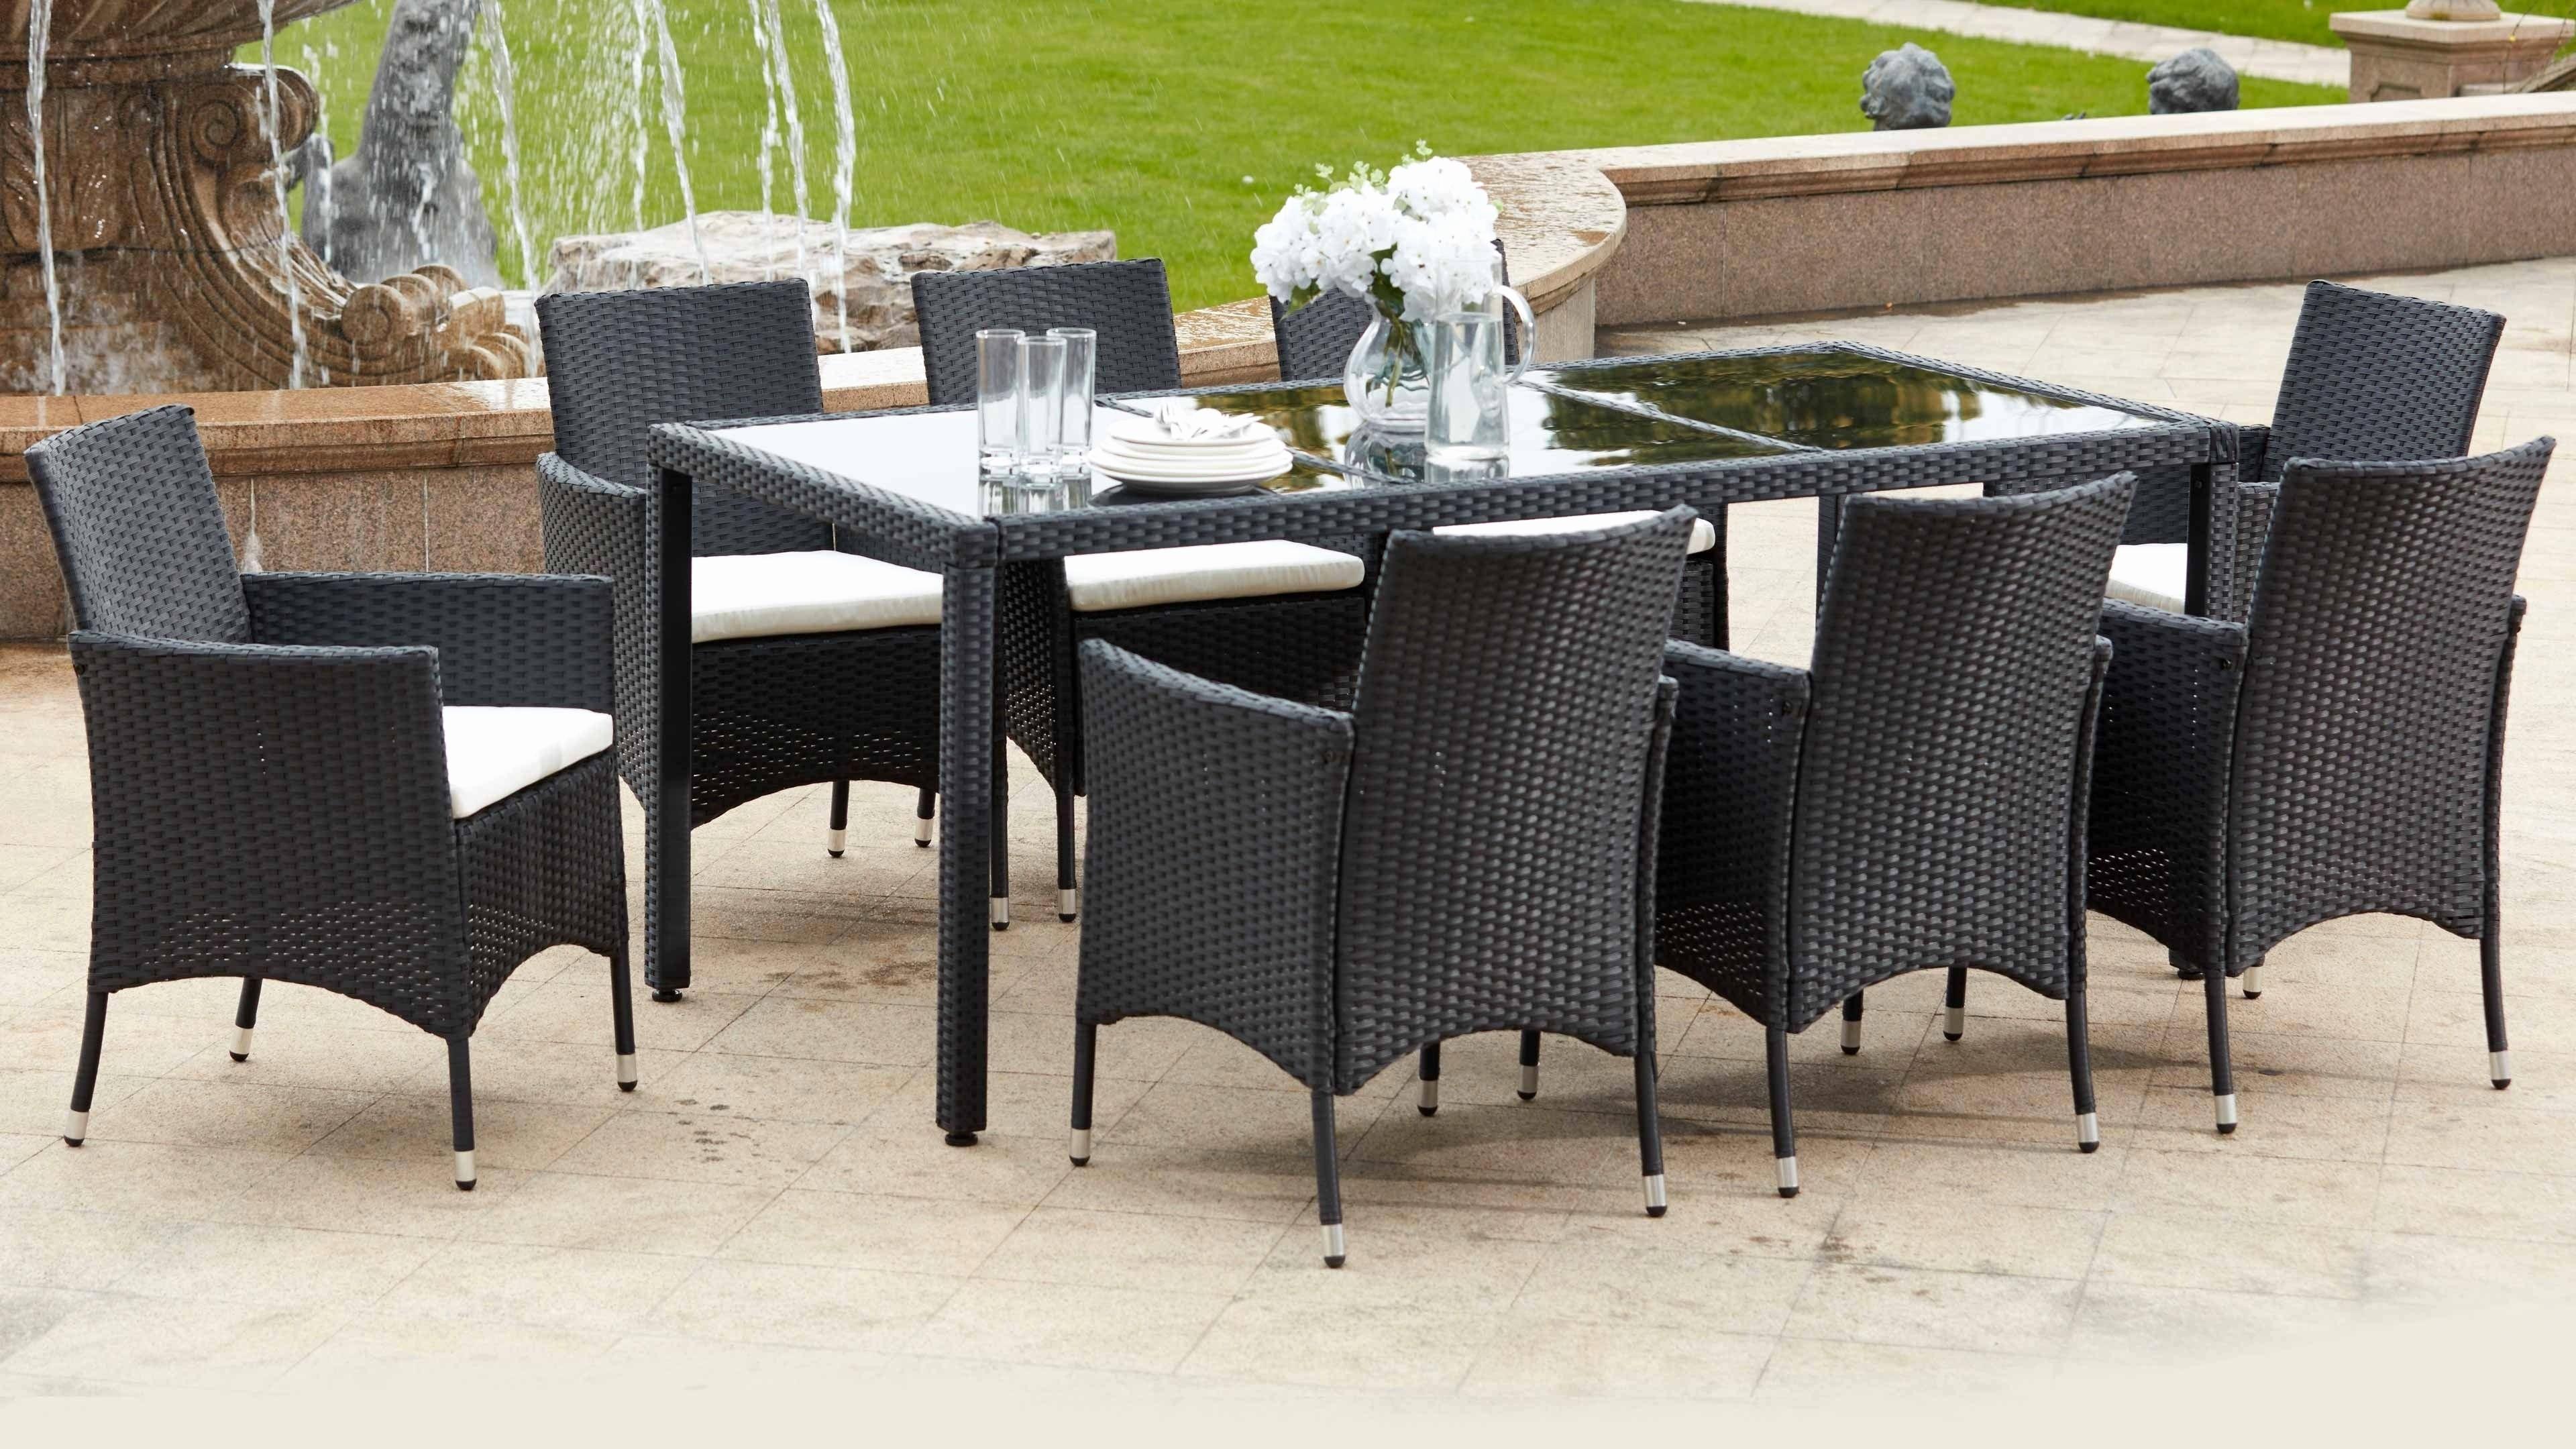 Table chaise jardin babou - veranda-styledevie.fr